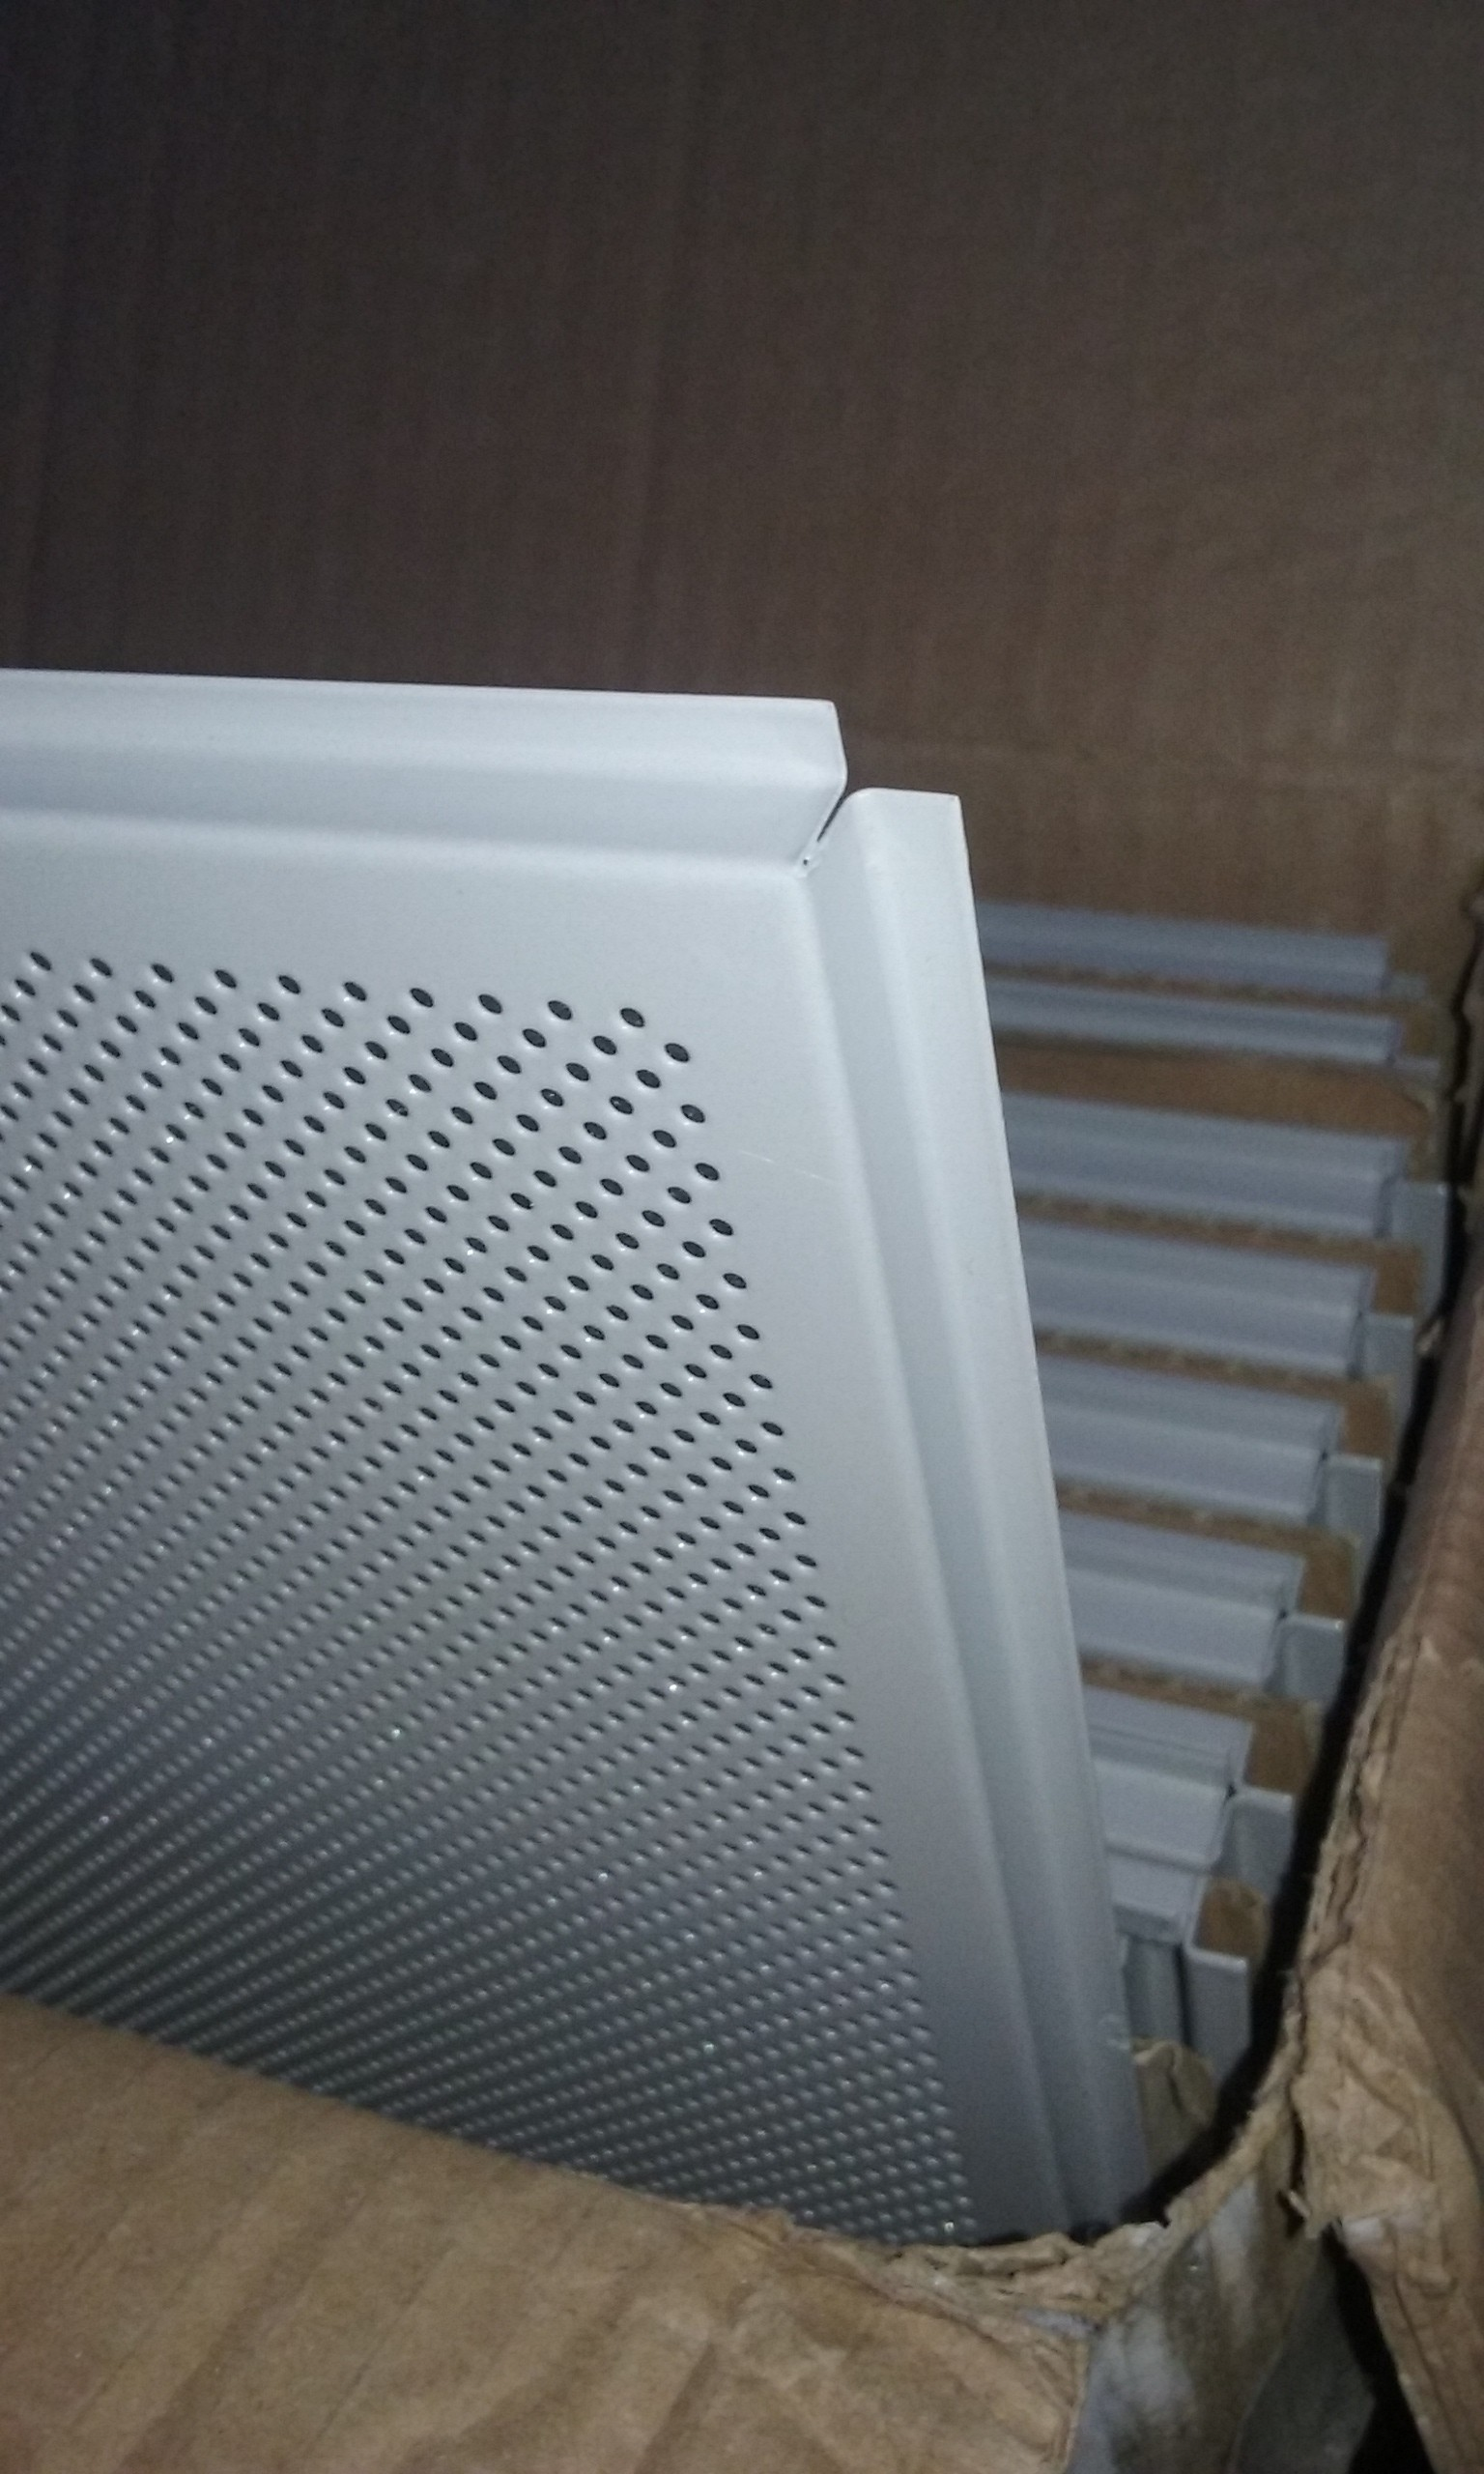 Armstrong Tegular Metal Ceiling Tiles 2 x 2 Pack of 16 | DiggersList